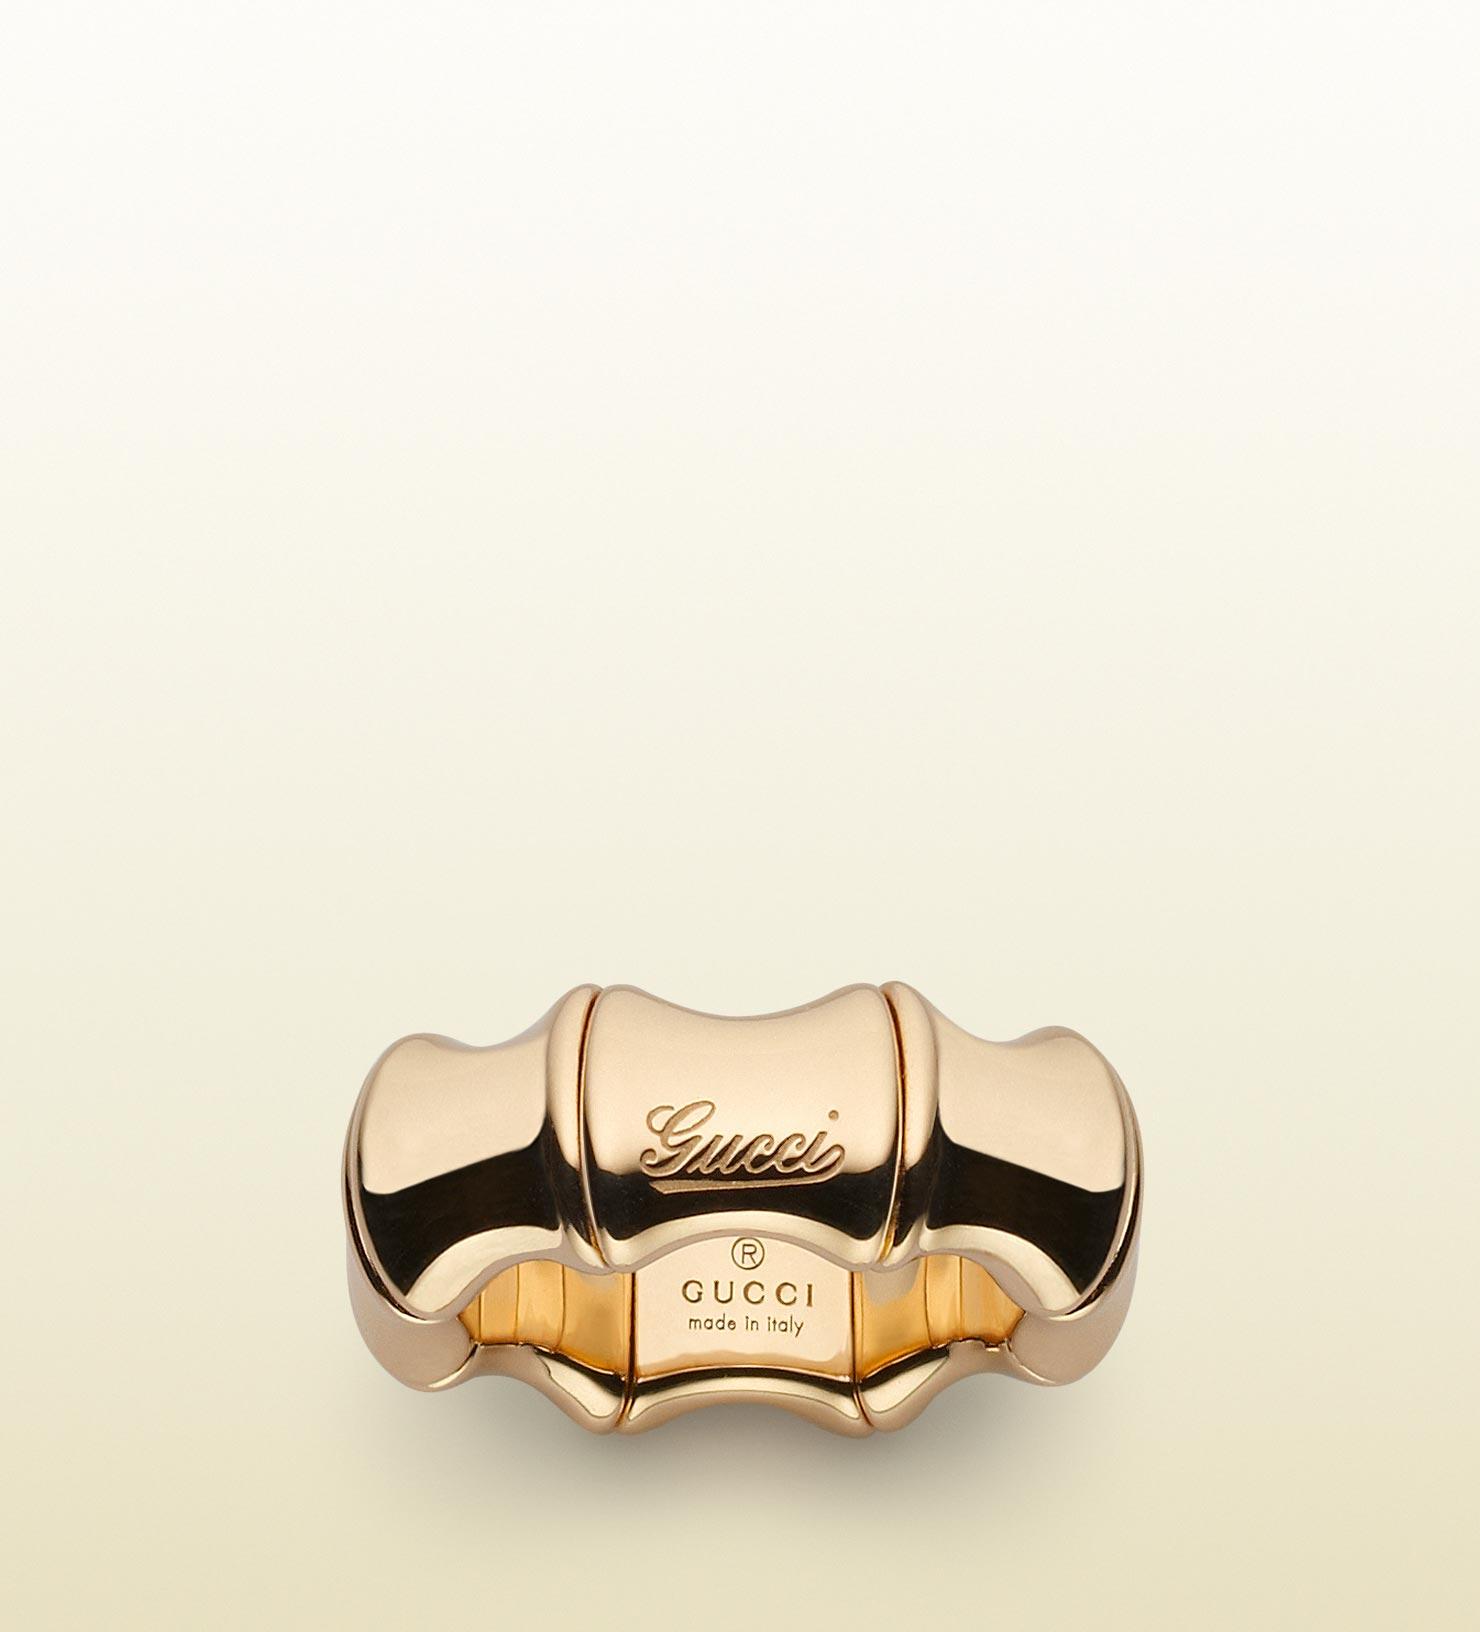 580a185cb Gucci Bamboo Ring in Metallic - Lyst